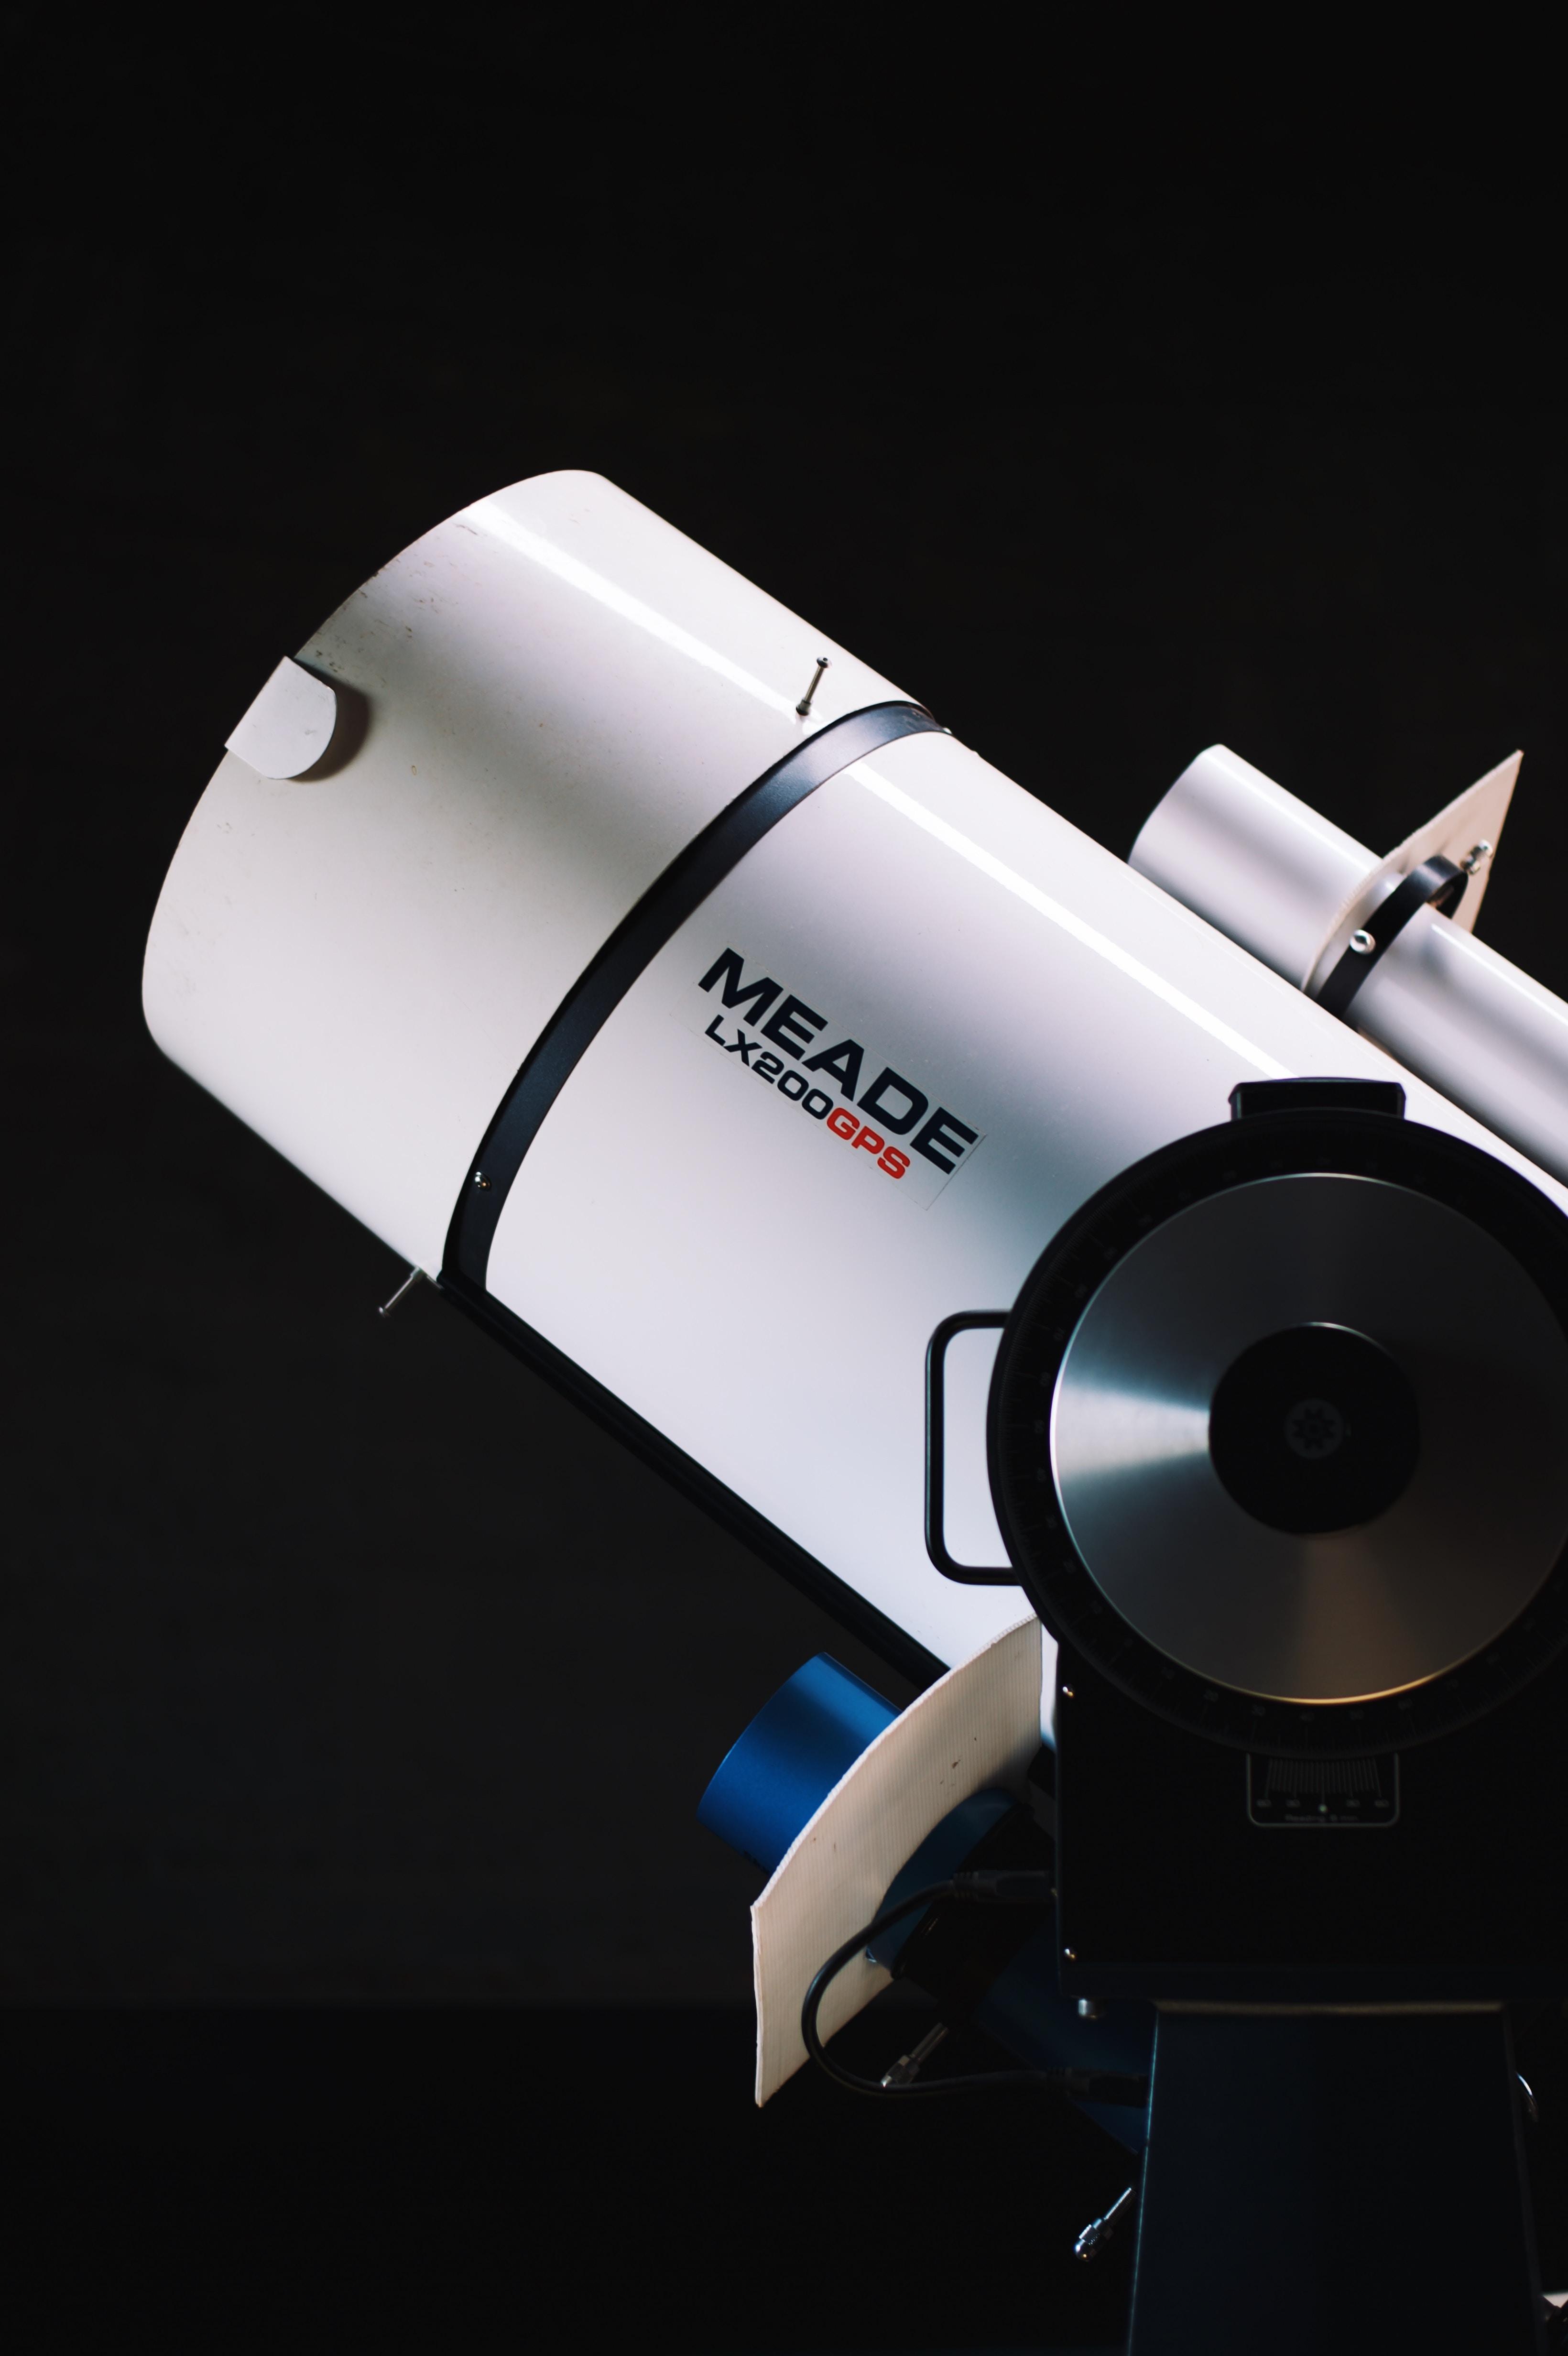 white Meade LX200GPS telescope beside black wall